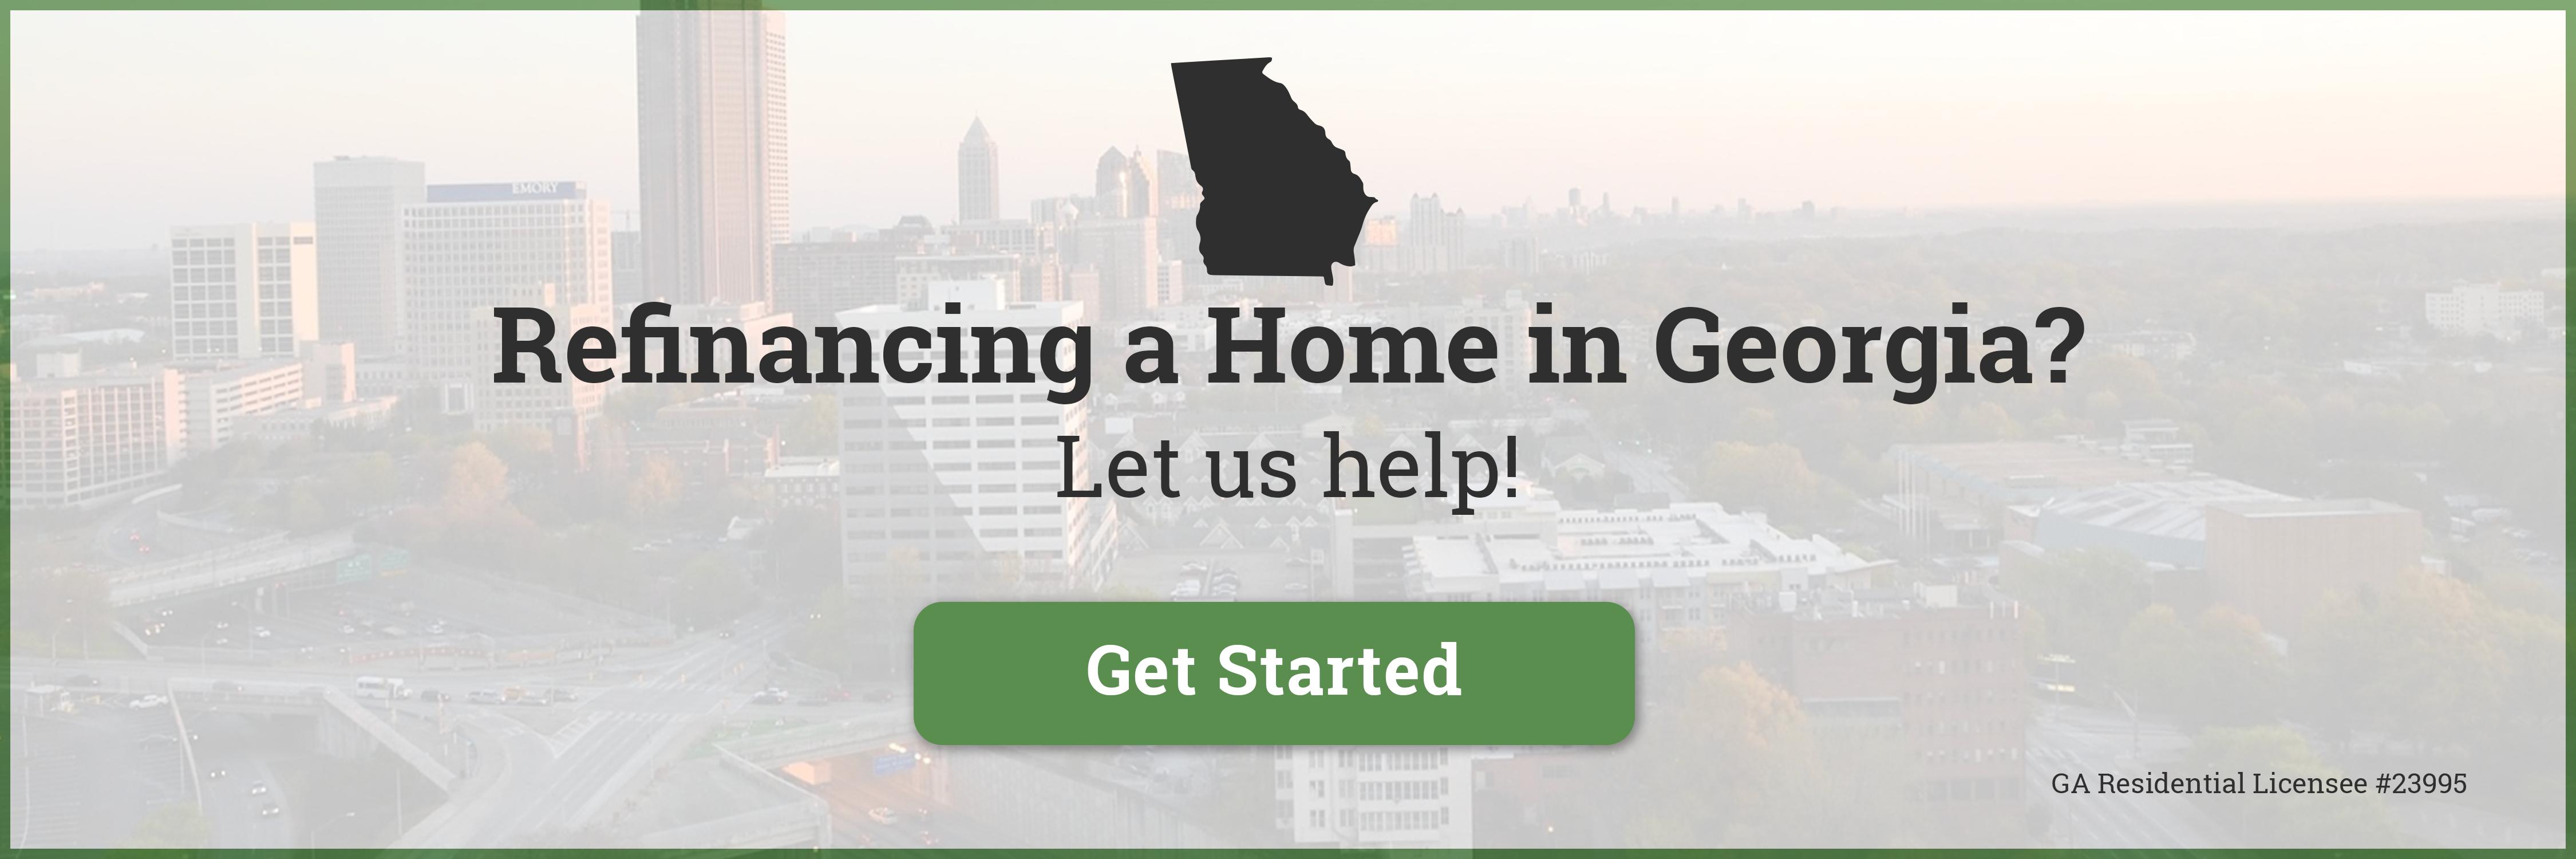 Refinancing a Home in Georgia?